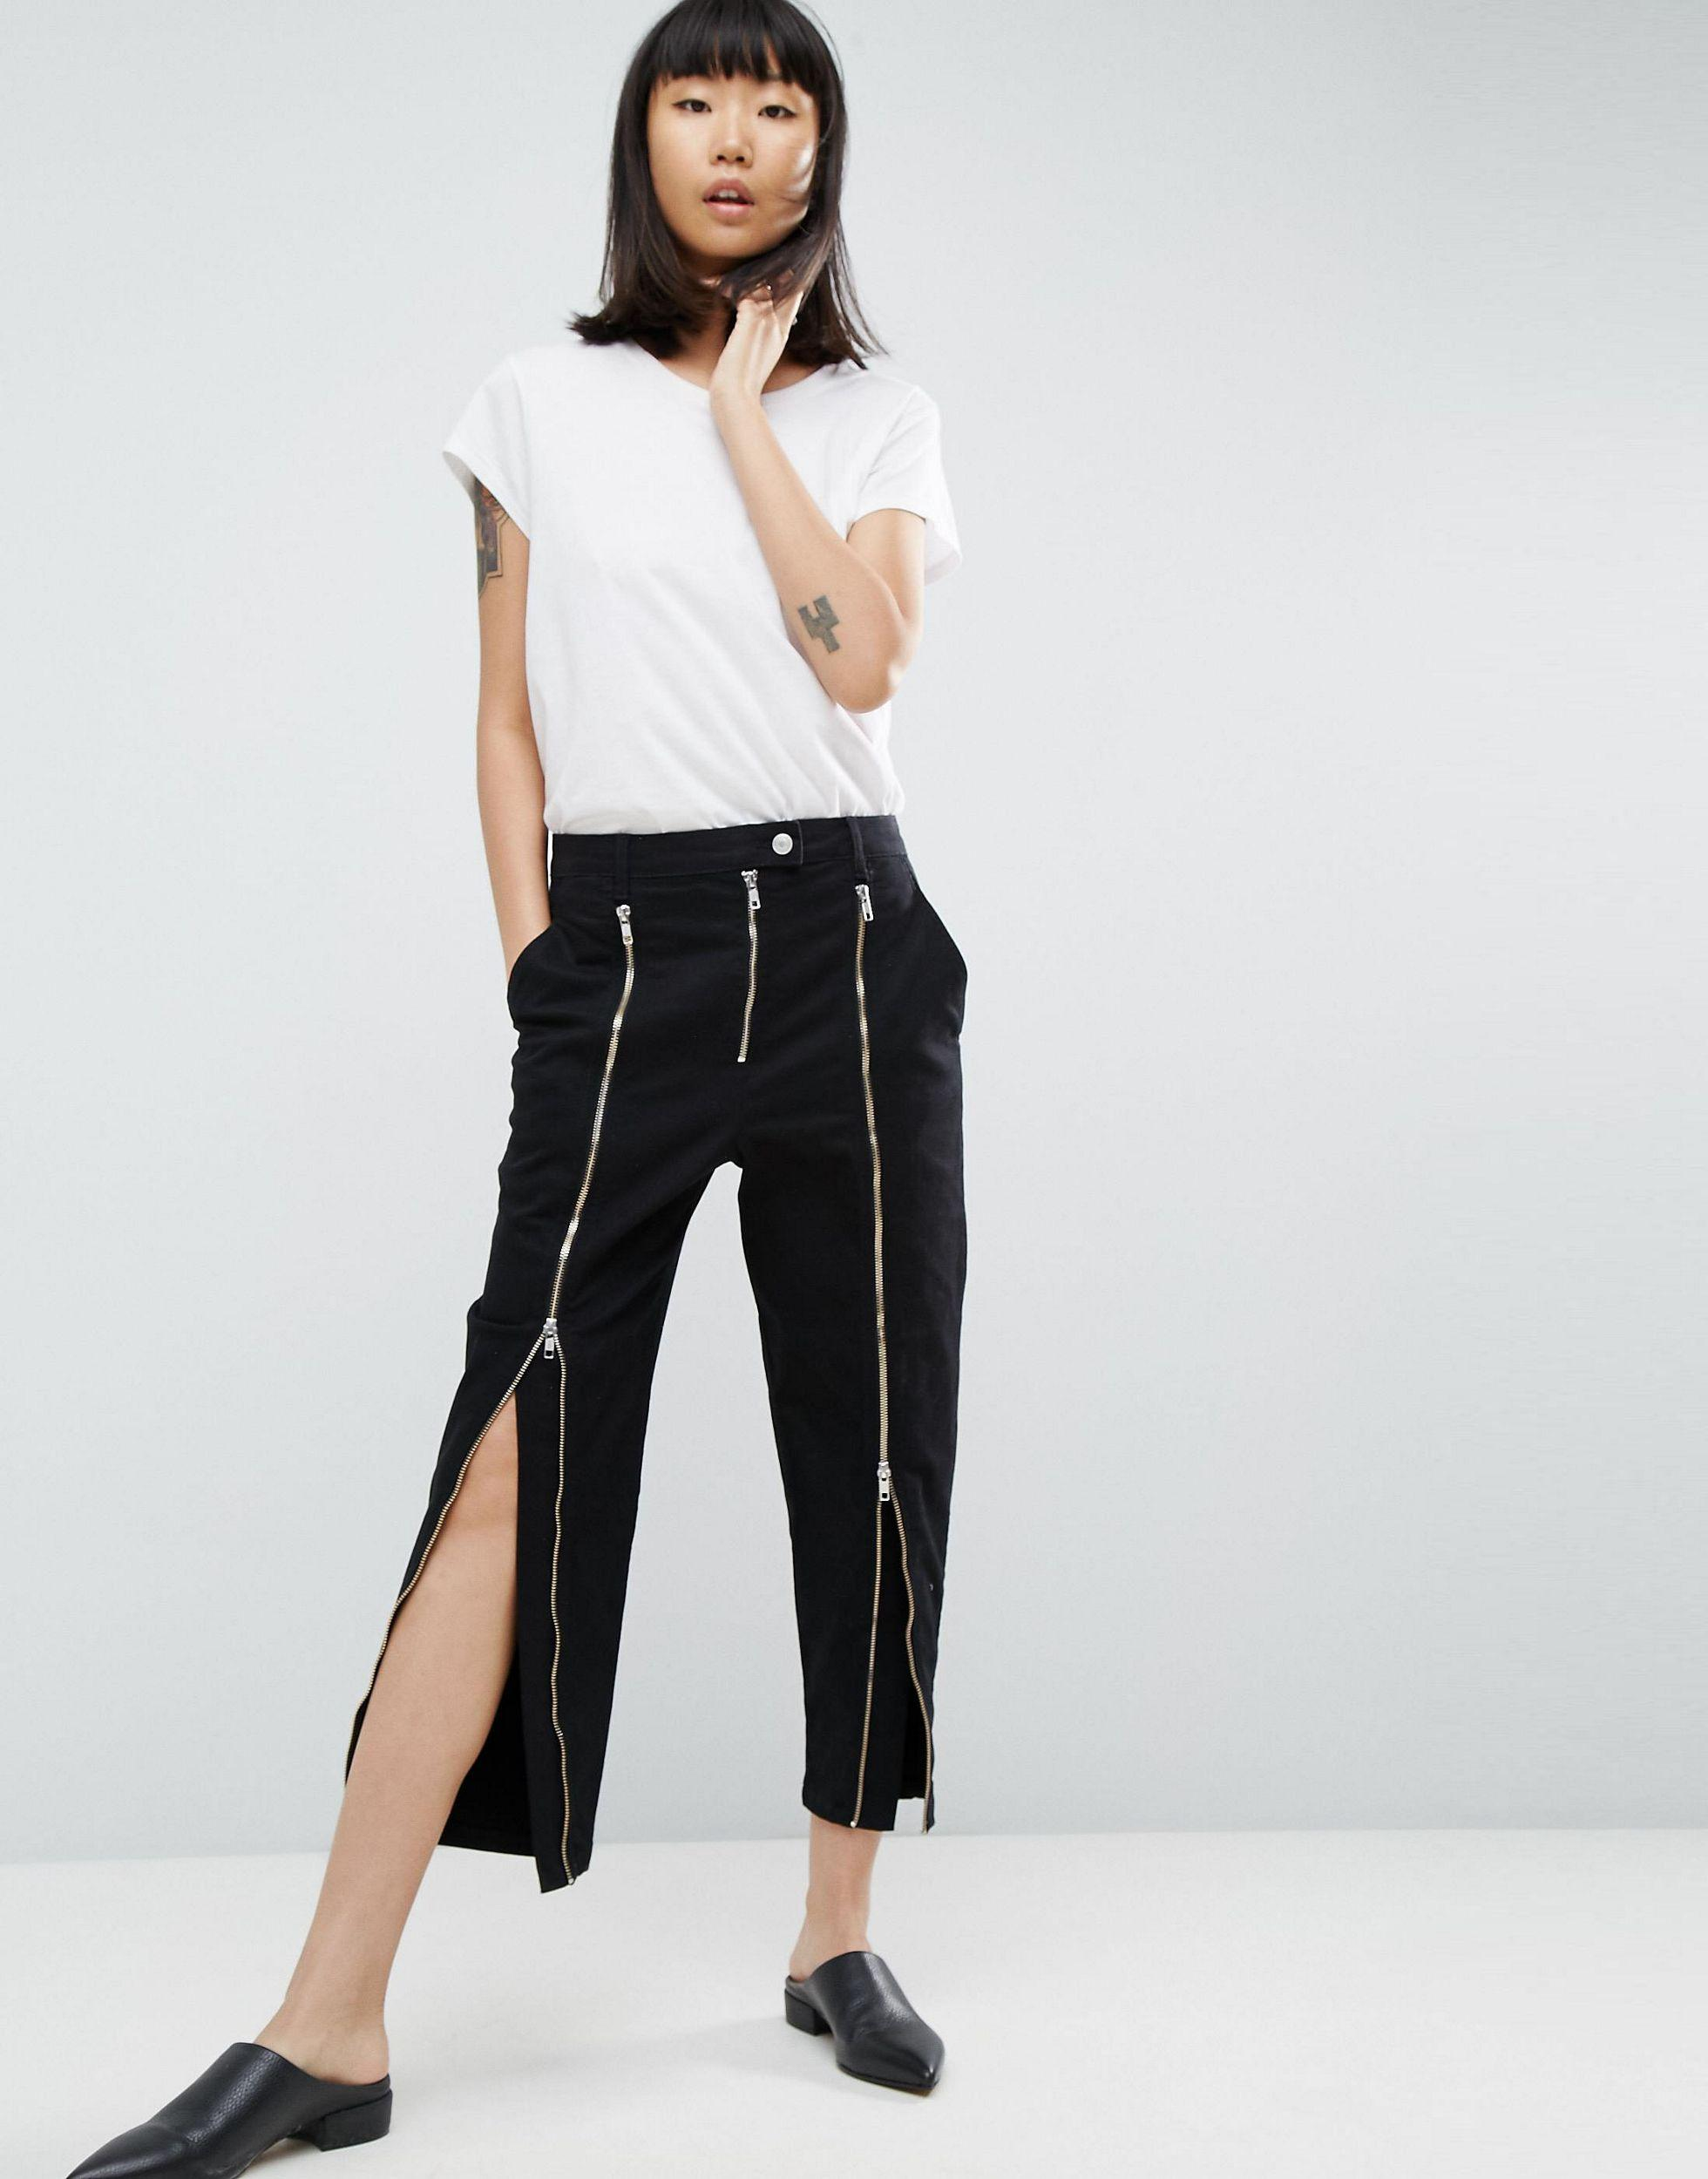 ASOS Denim Ovoid Jean With Zip Detail in Black